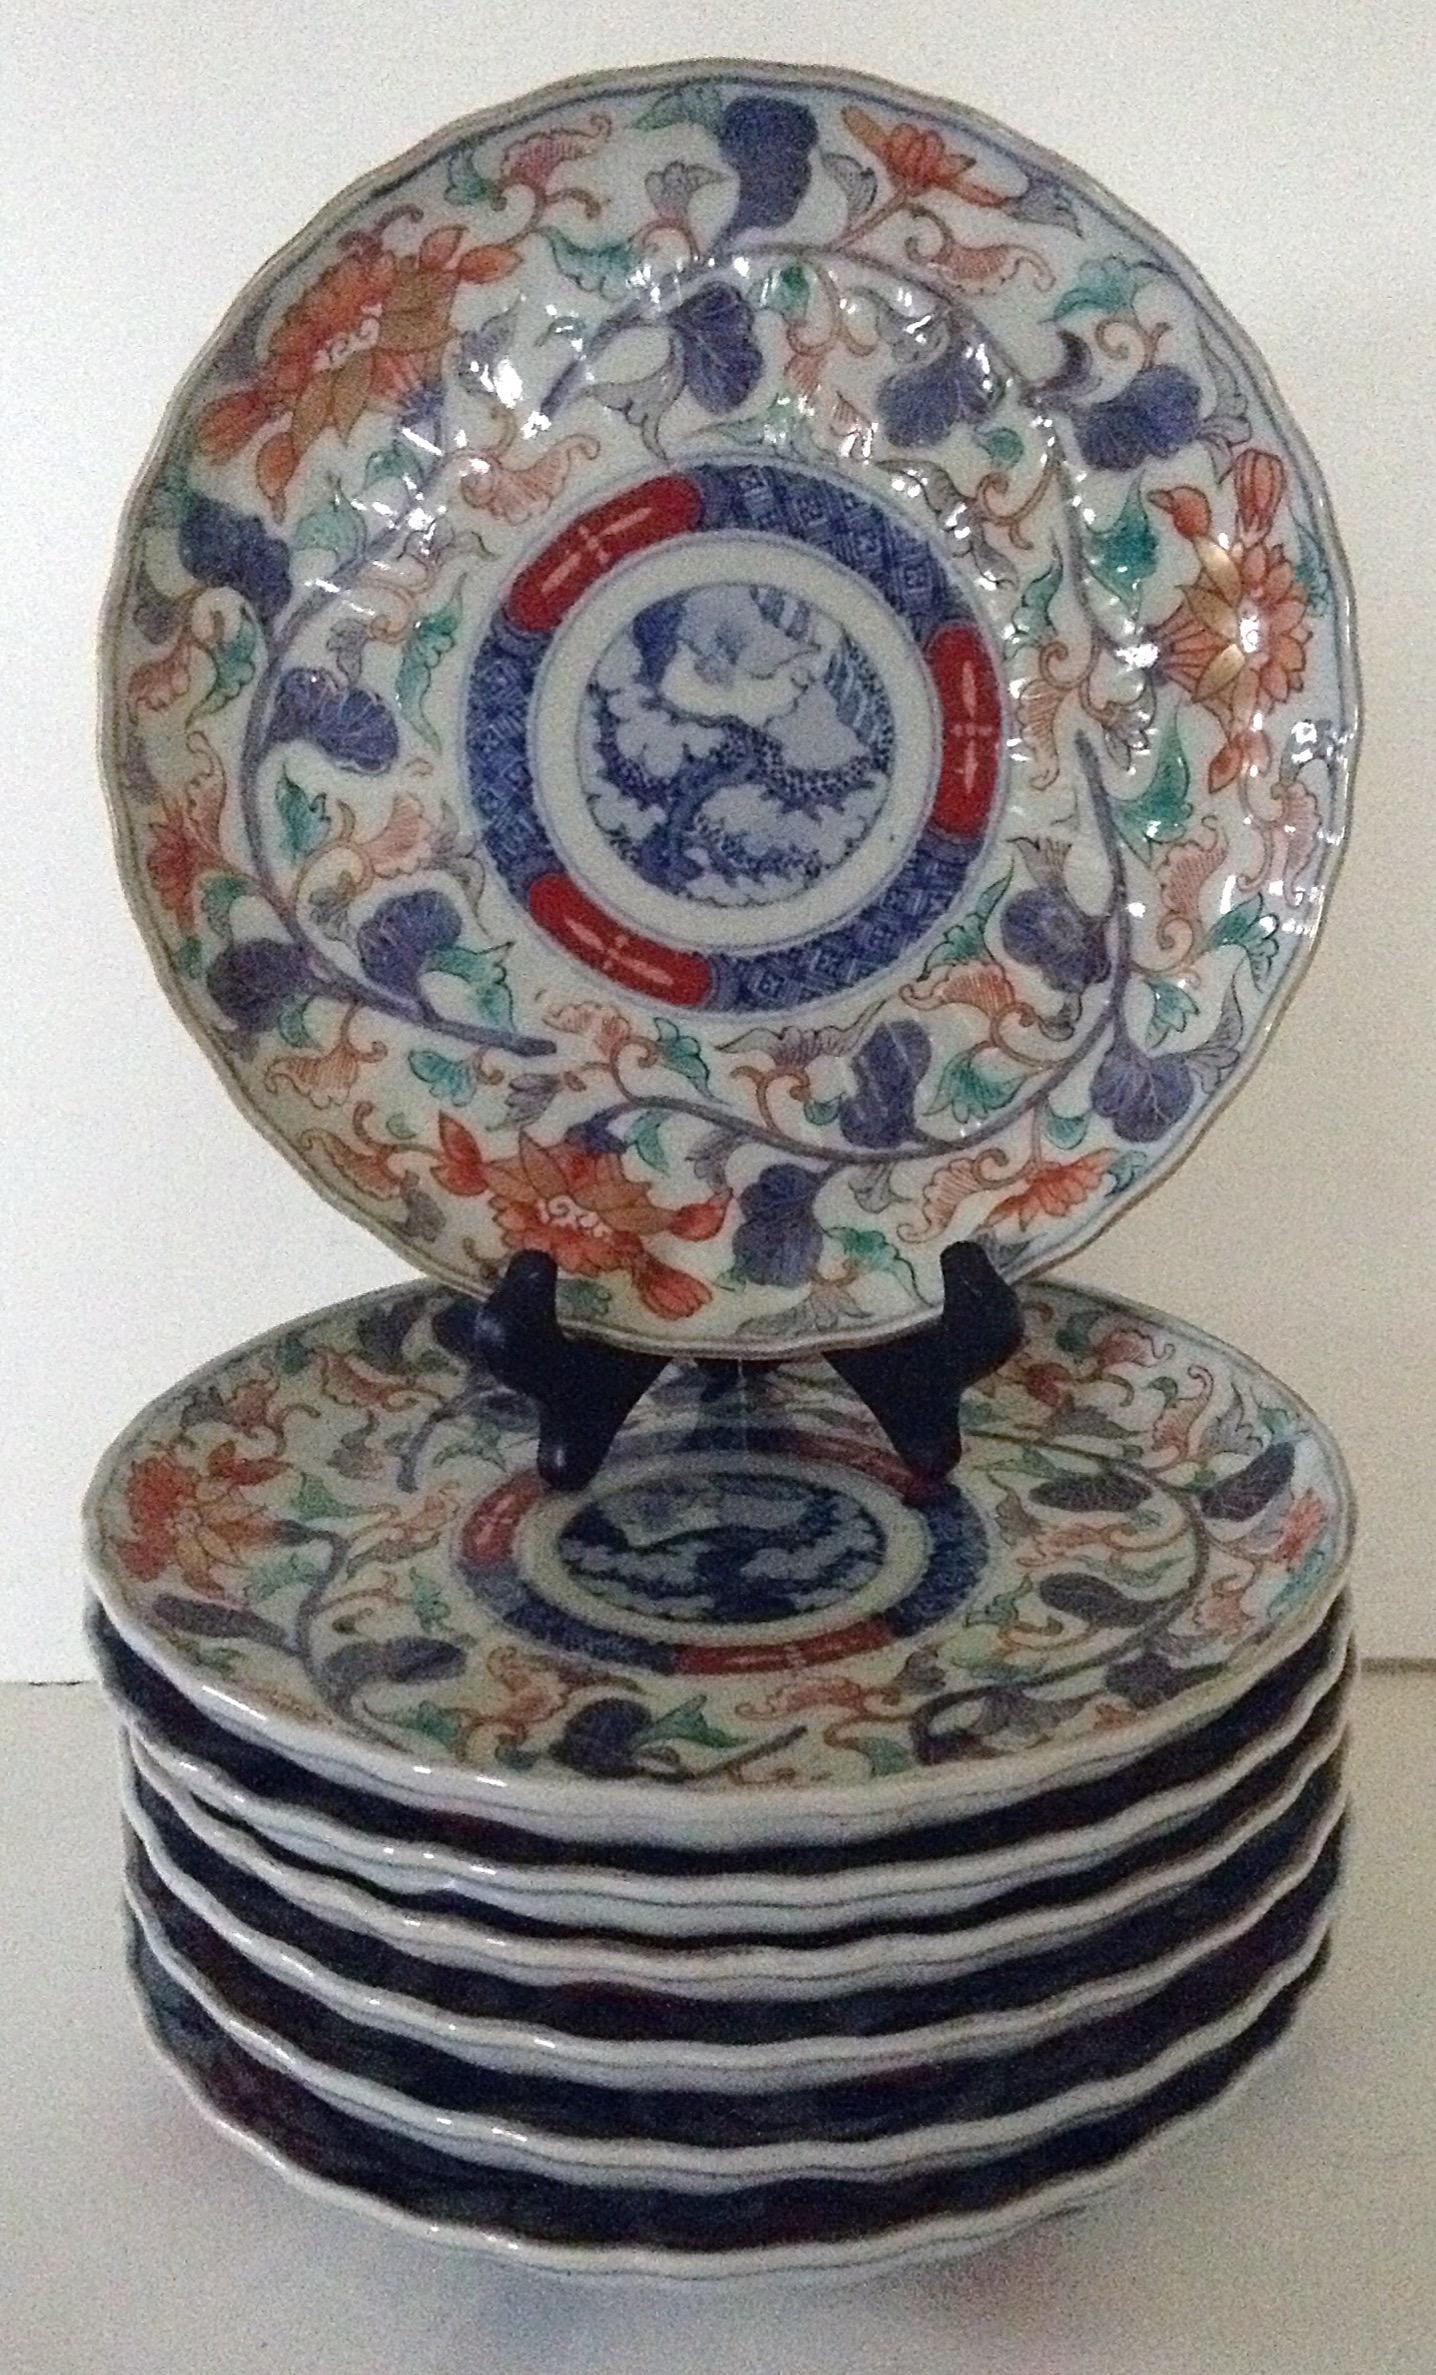 Japanese Floral Imari Plates - Set of 7 - Image 2 of 3  sc 1 st  Chairish & Japanese Floral Imari Plates - Set of 7 | Chairish